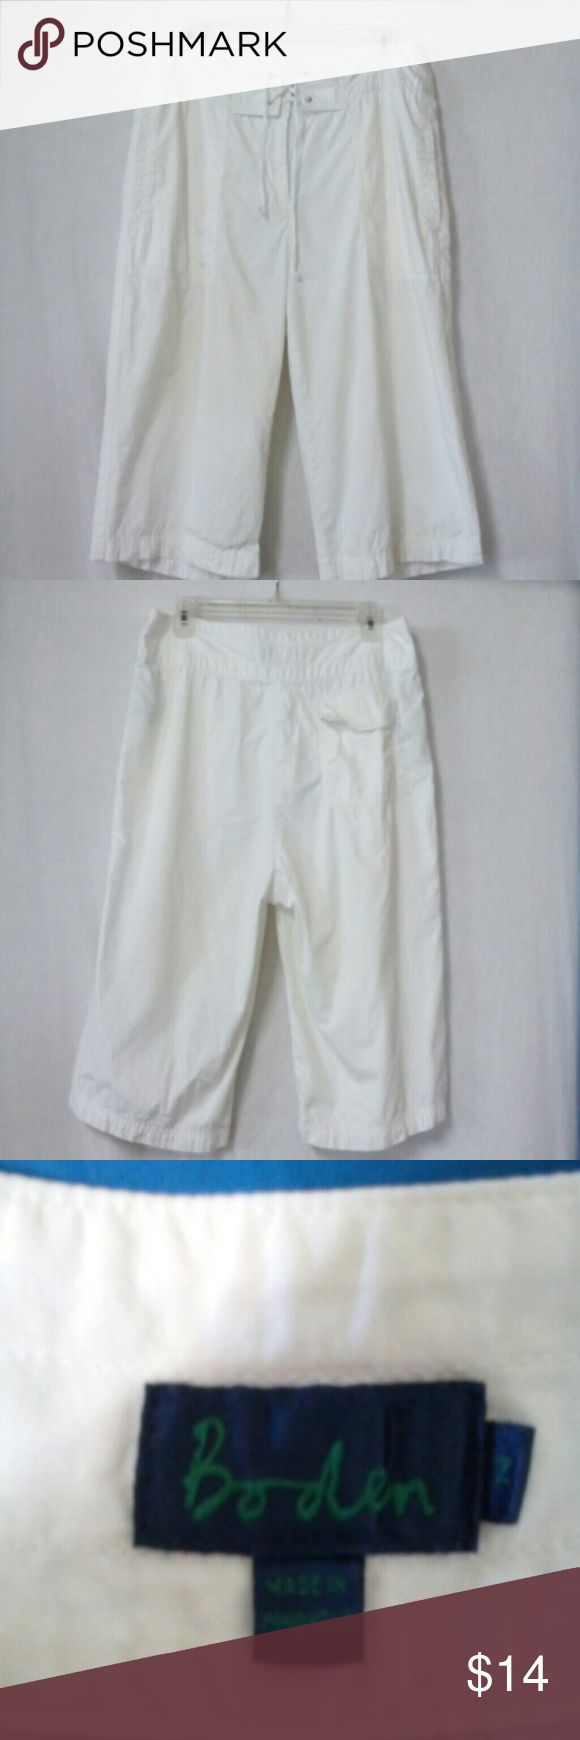 Boden women size 14 Bermuda shorts 3 pockets, front ties boden Shorts Bermudas